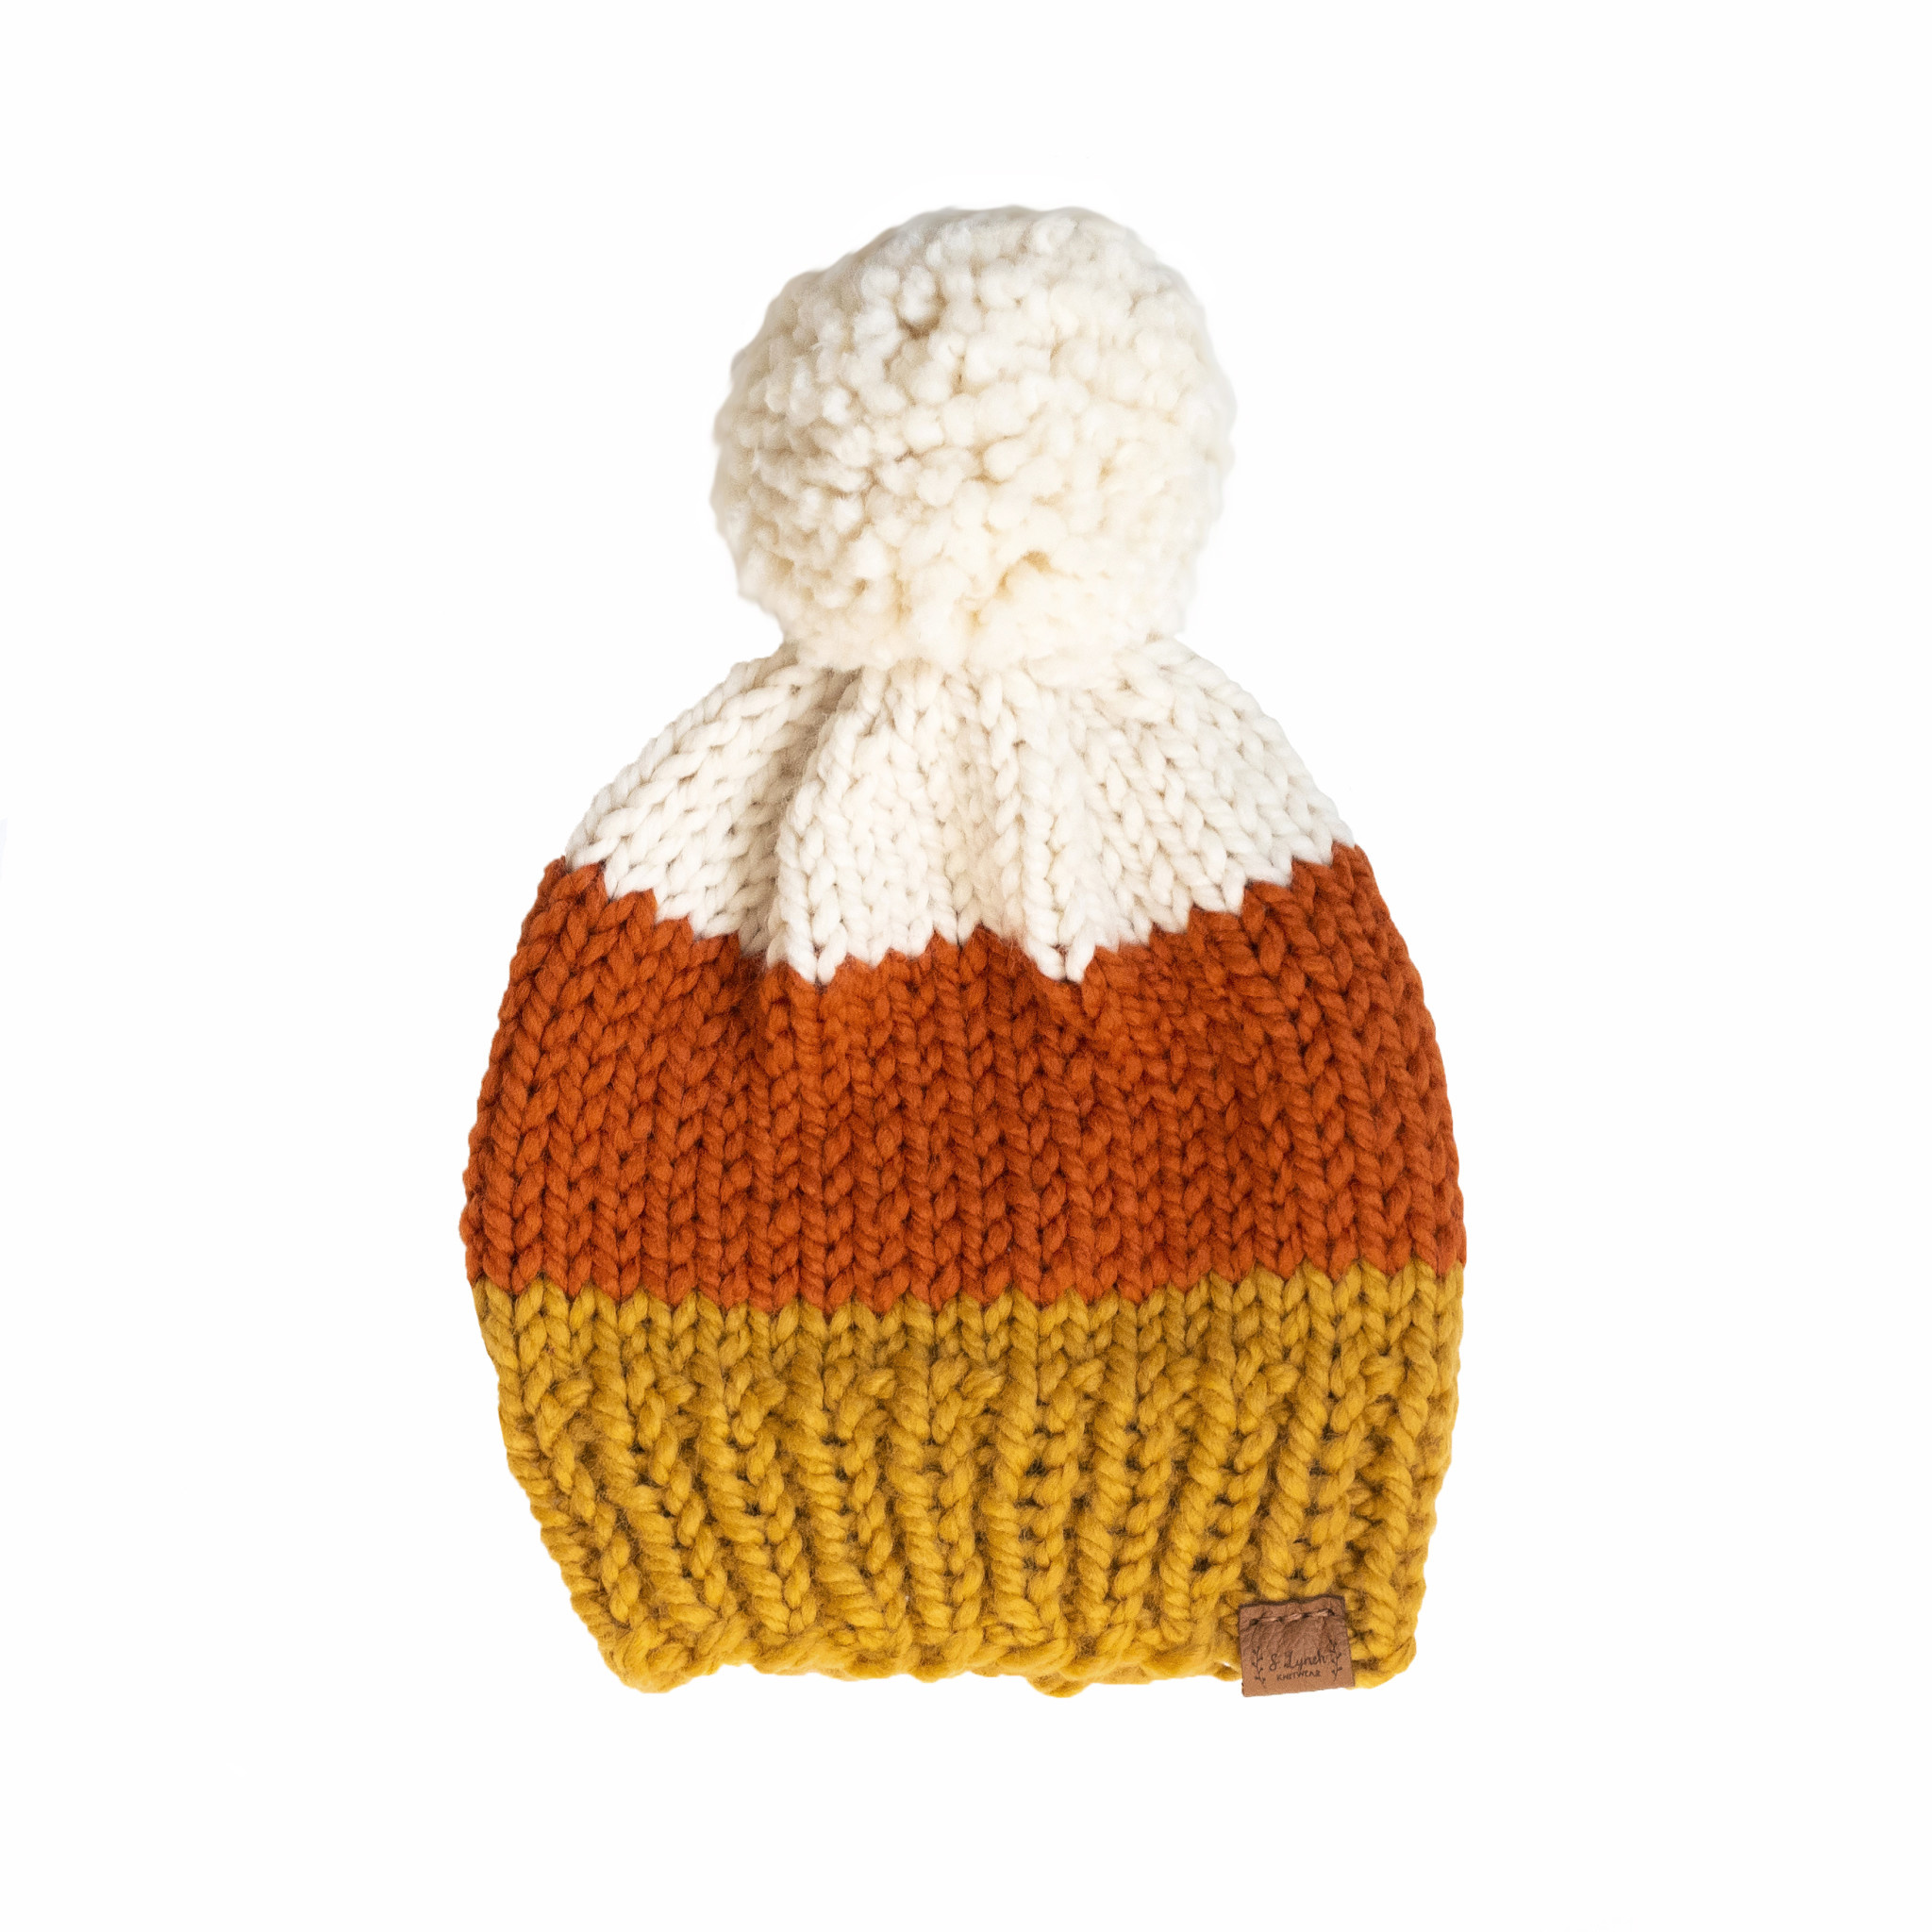 S. Lynch Knitwear Baby Hat - Candy Corn - 6-12M